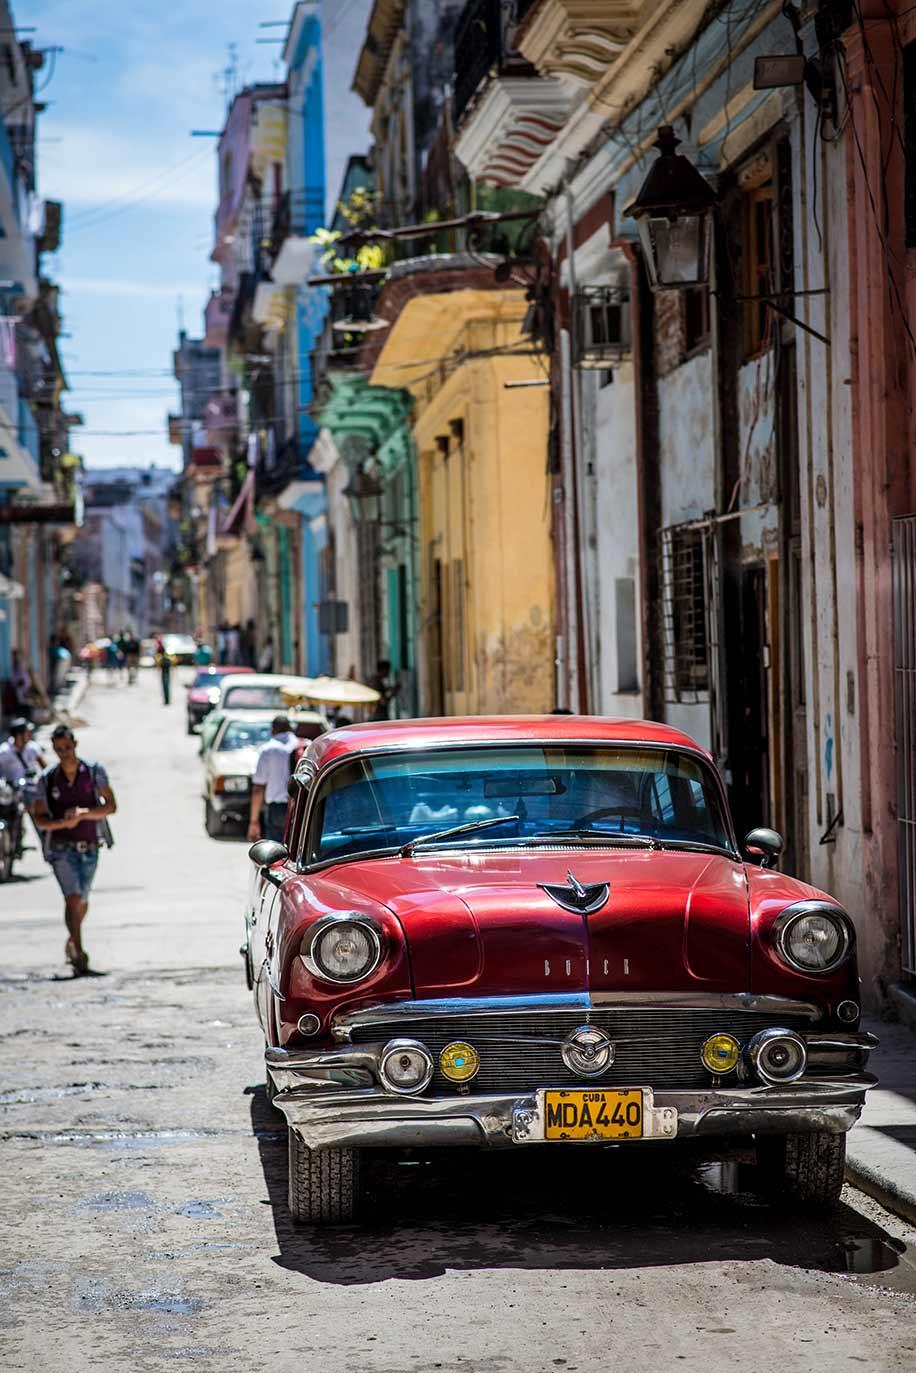 Cuba with the Nikon D800